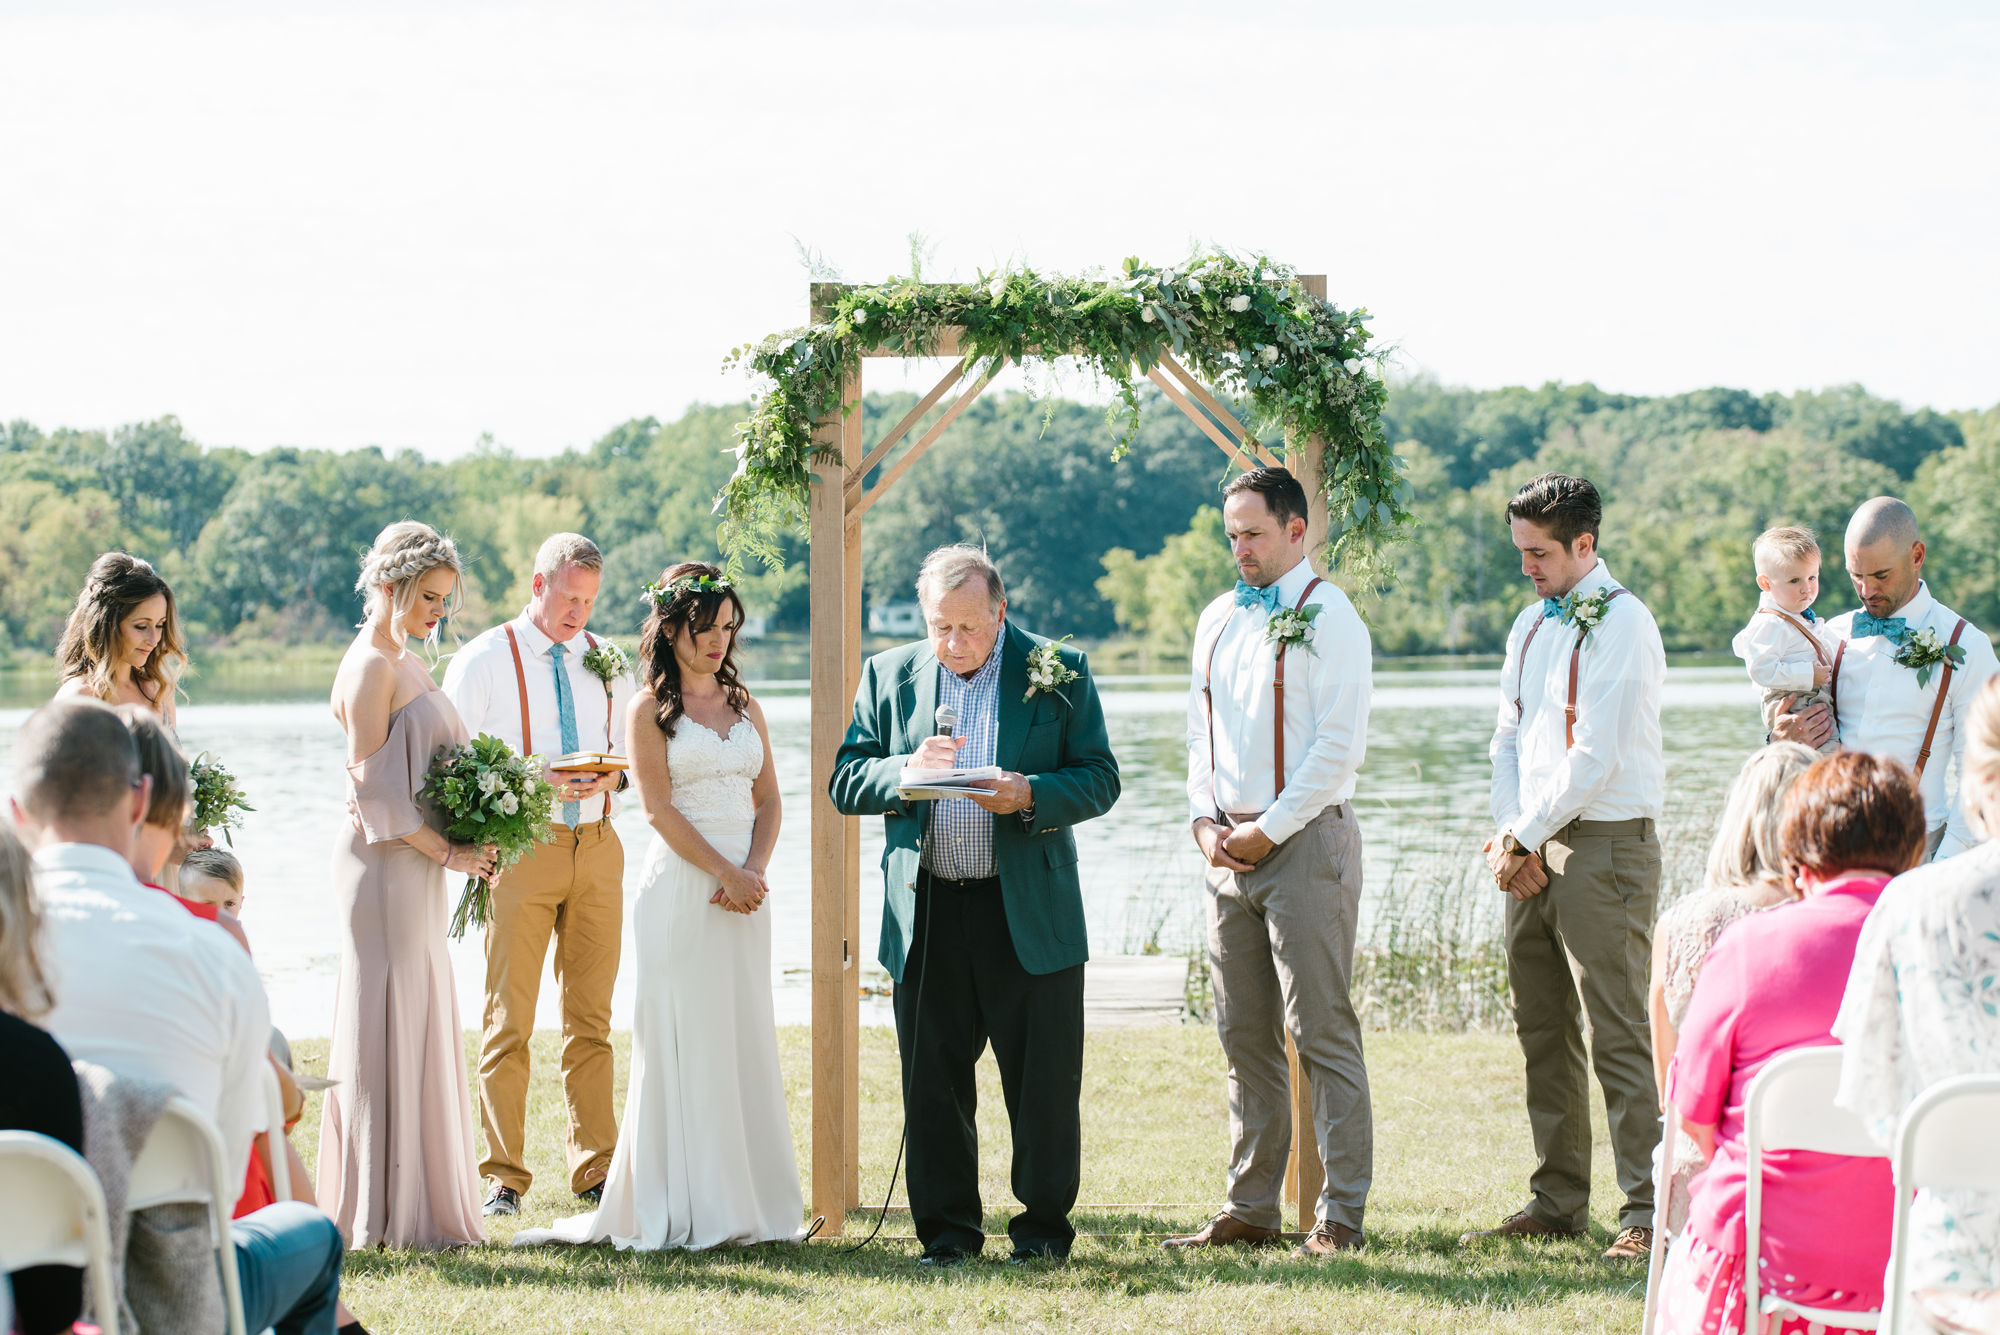 Quincy-Coldwater-Michigan-farm-wedding-photogapher-sydney-marie (141).jpg